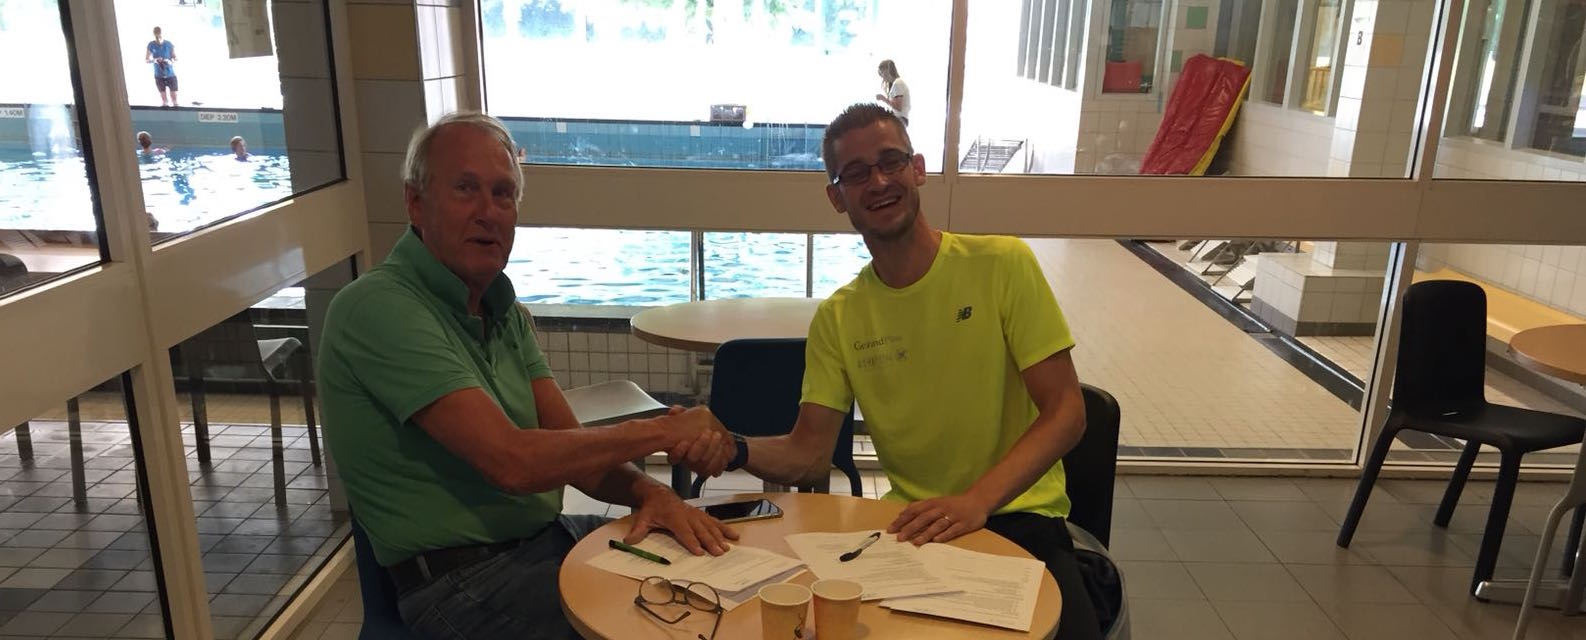 ZV de Zaan en Nova Fysio & Performance gaan samenwerken!